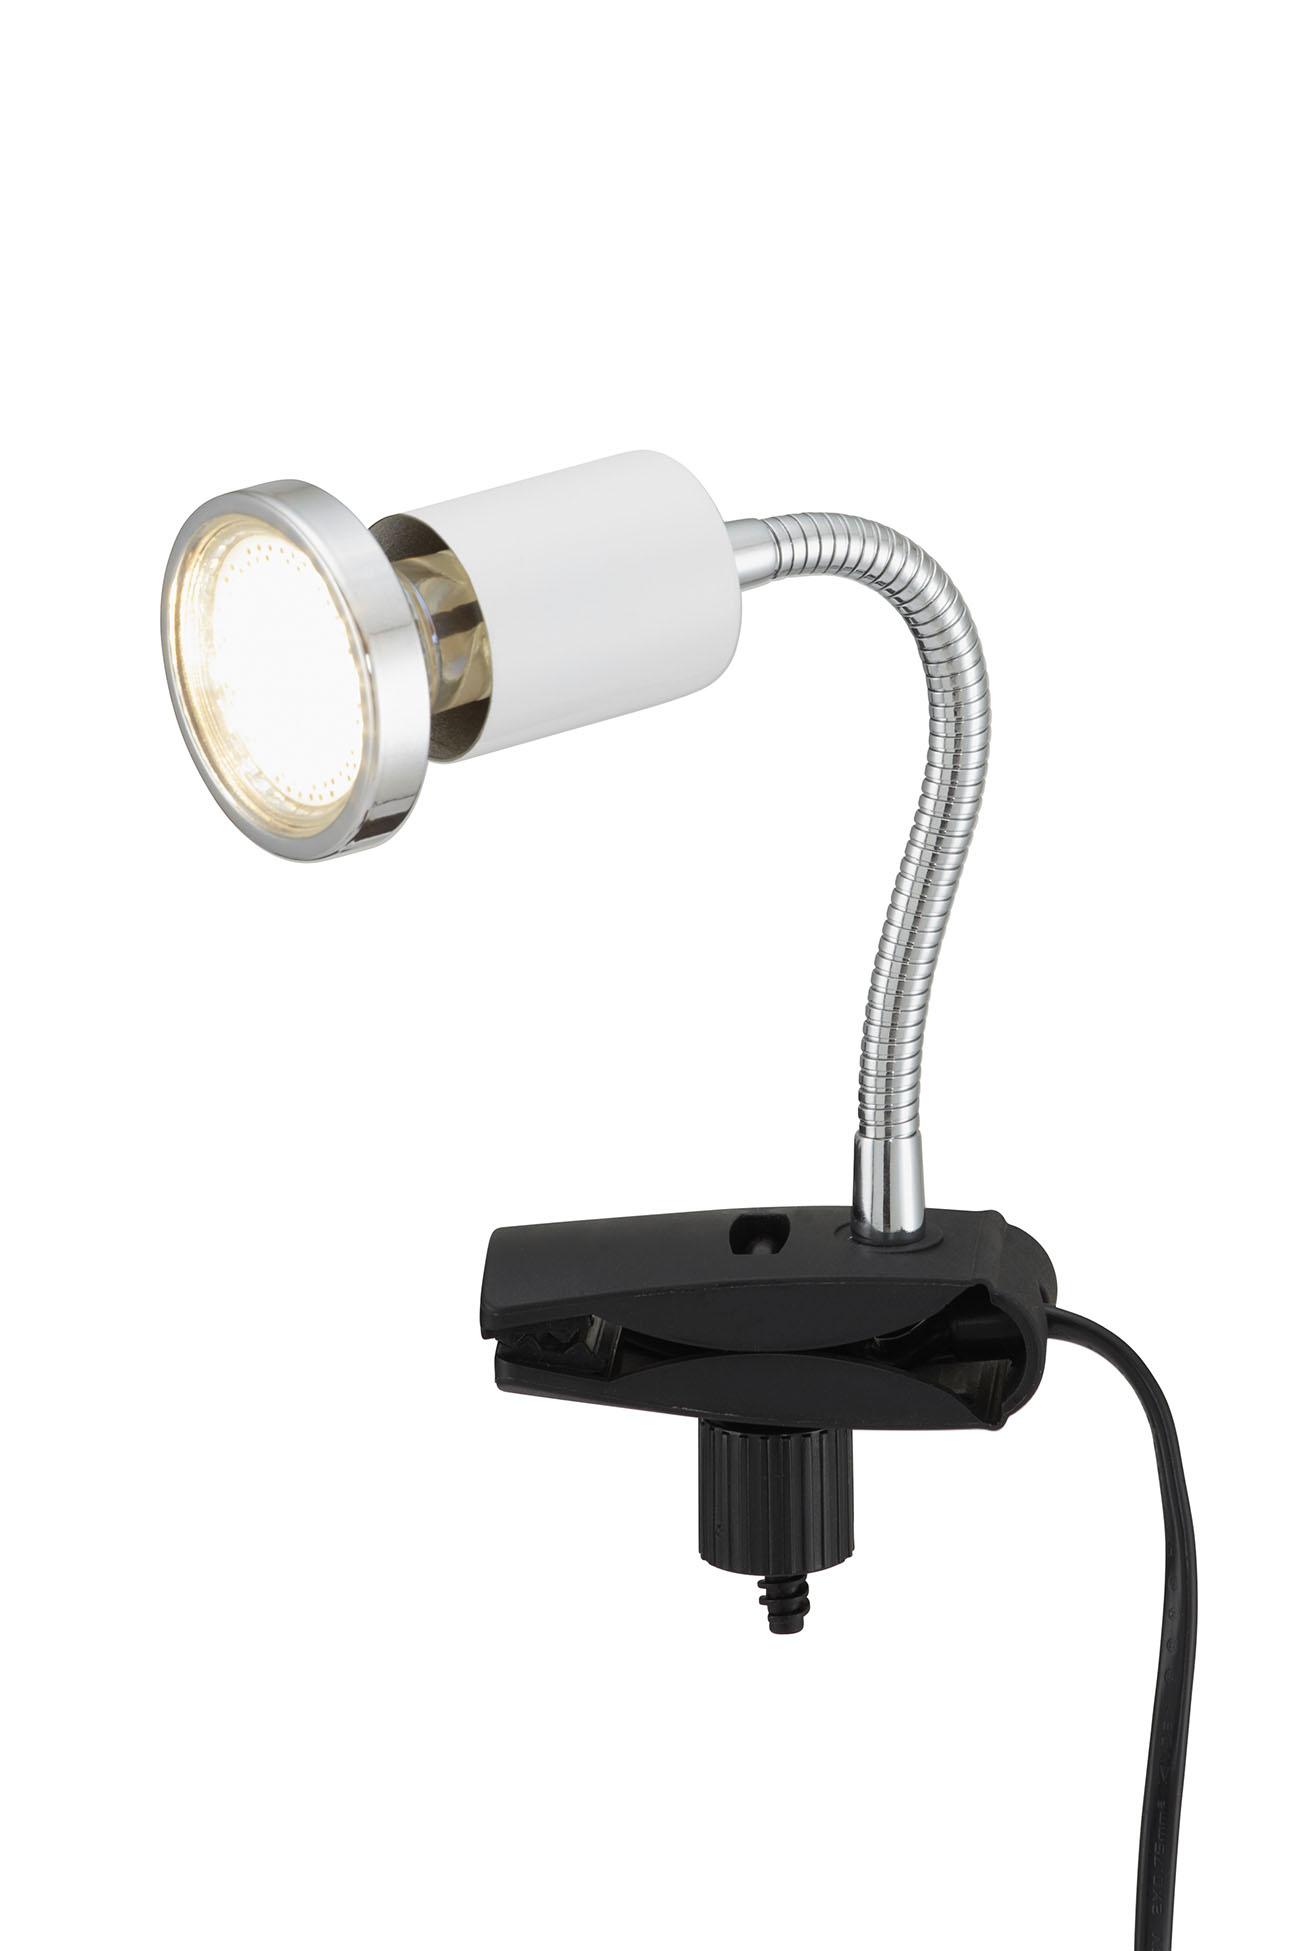 LED Klemmleuchte, 3,5 cm, 3 W, Weiß